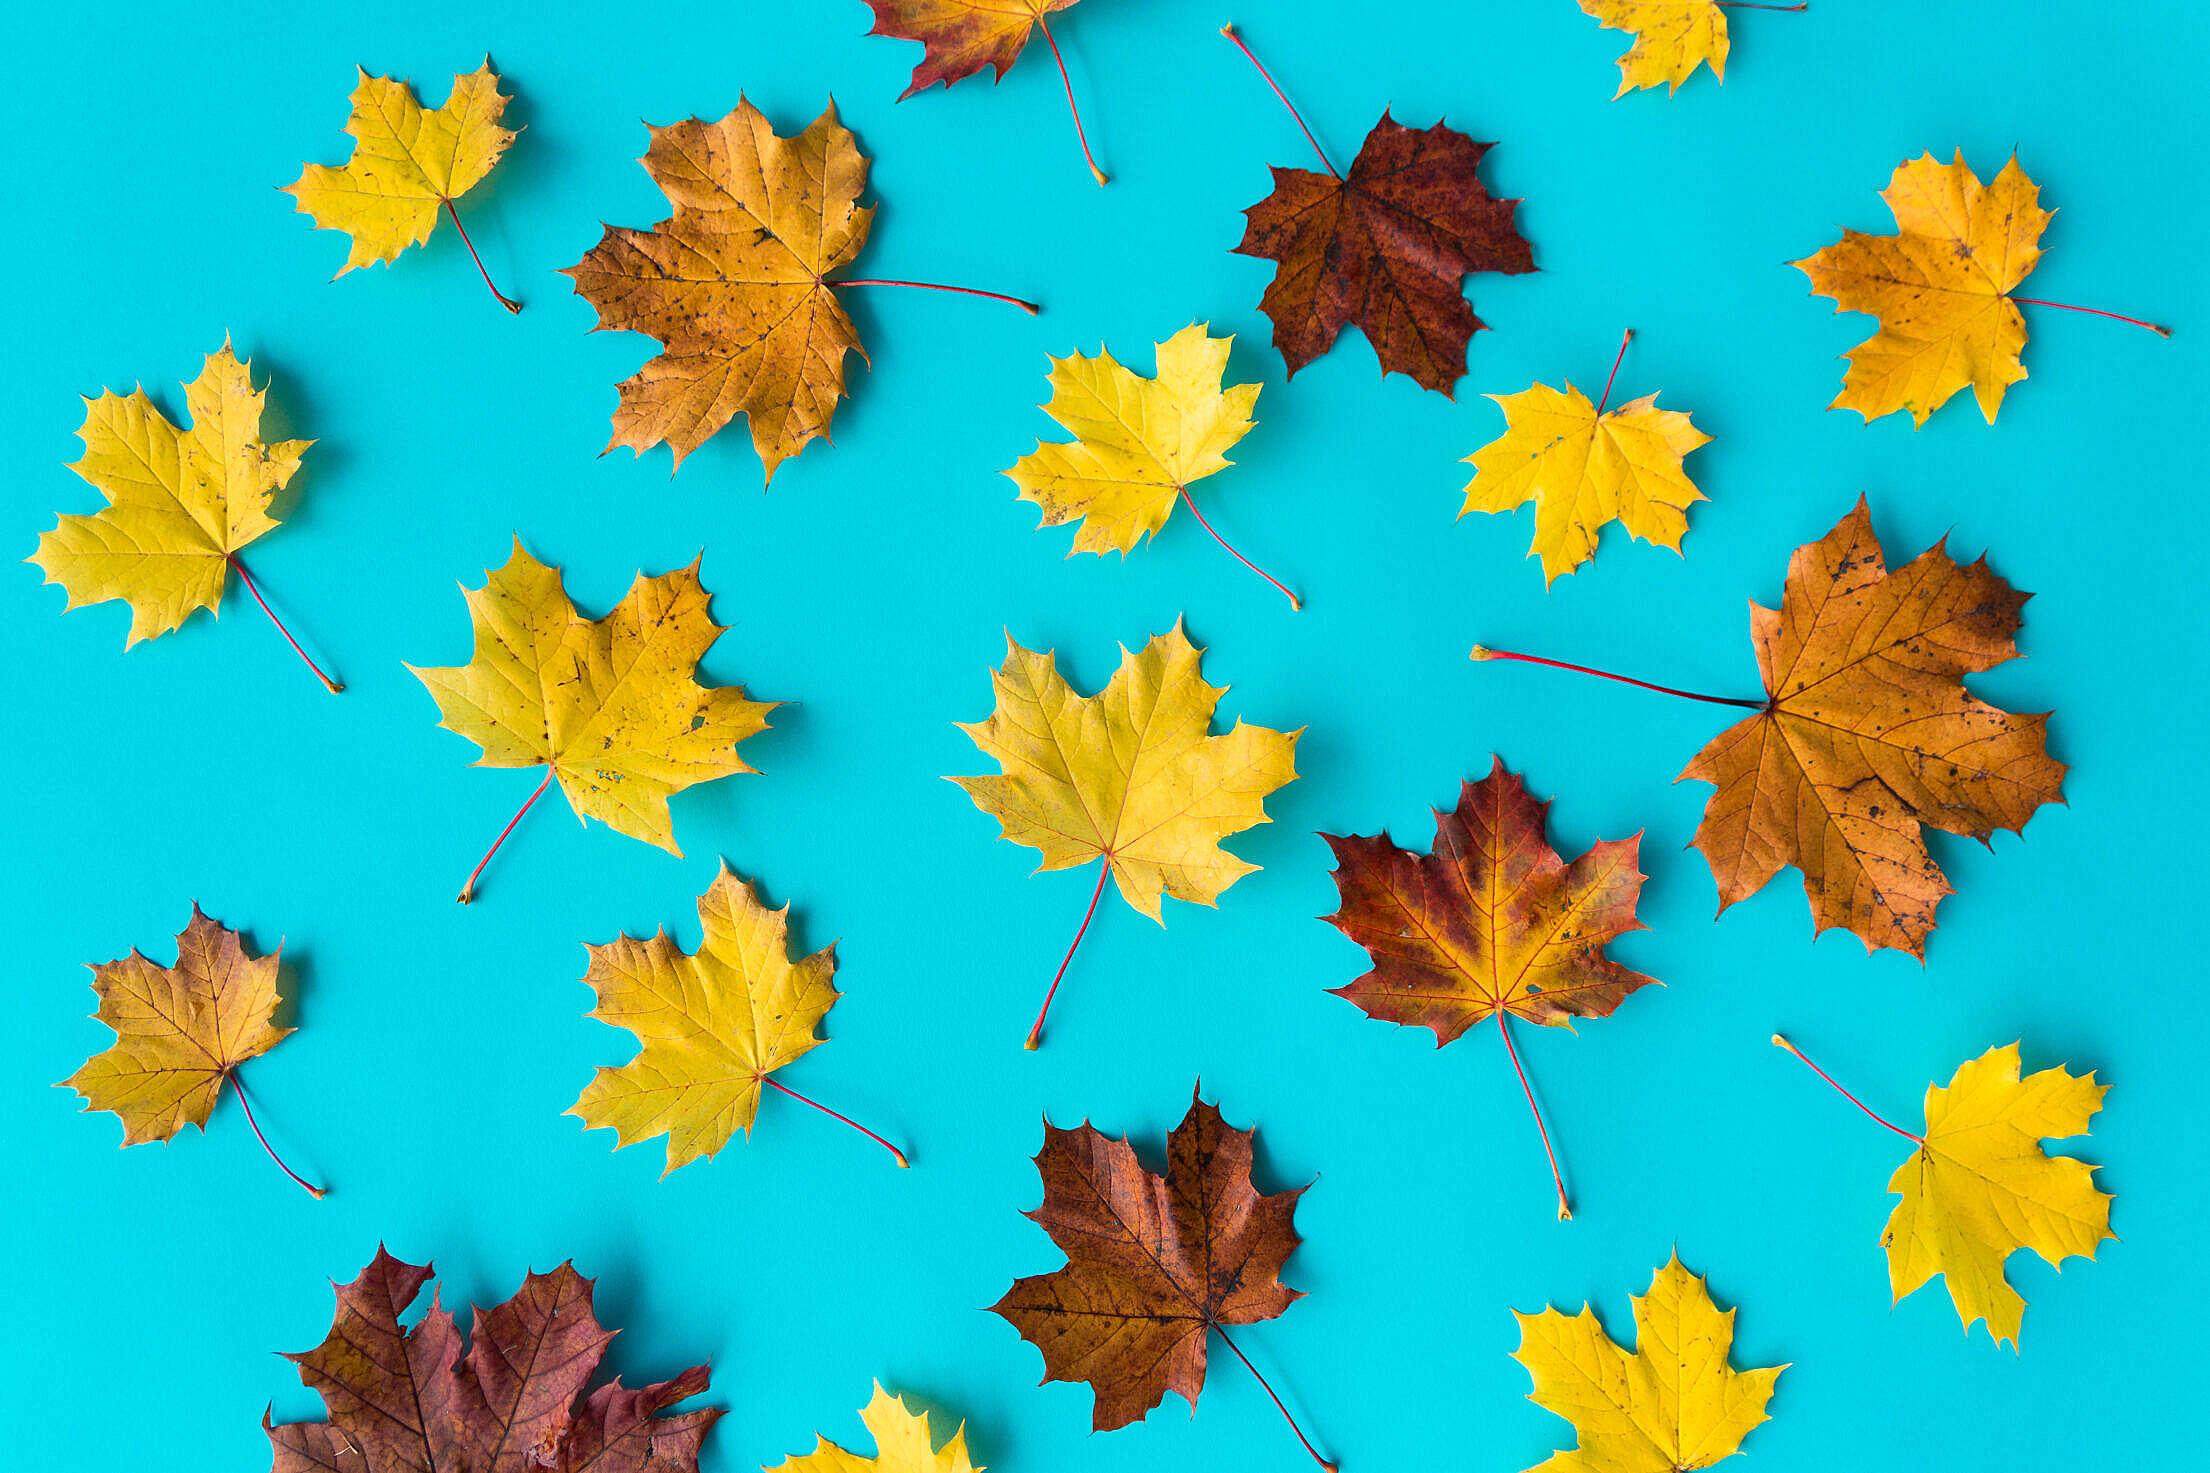 Autumn Leaves on Flat Blue Background #2 Free Stock Photo